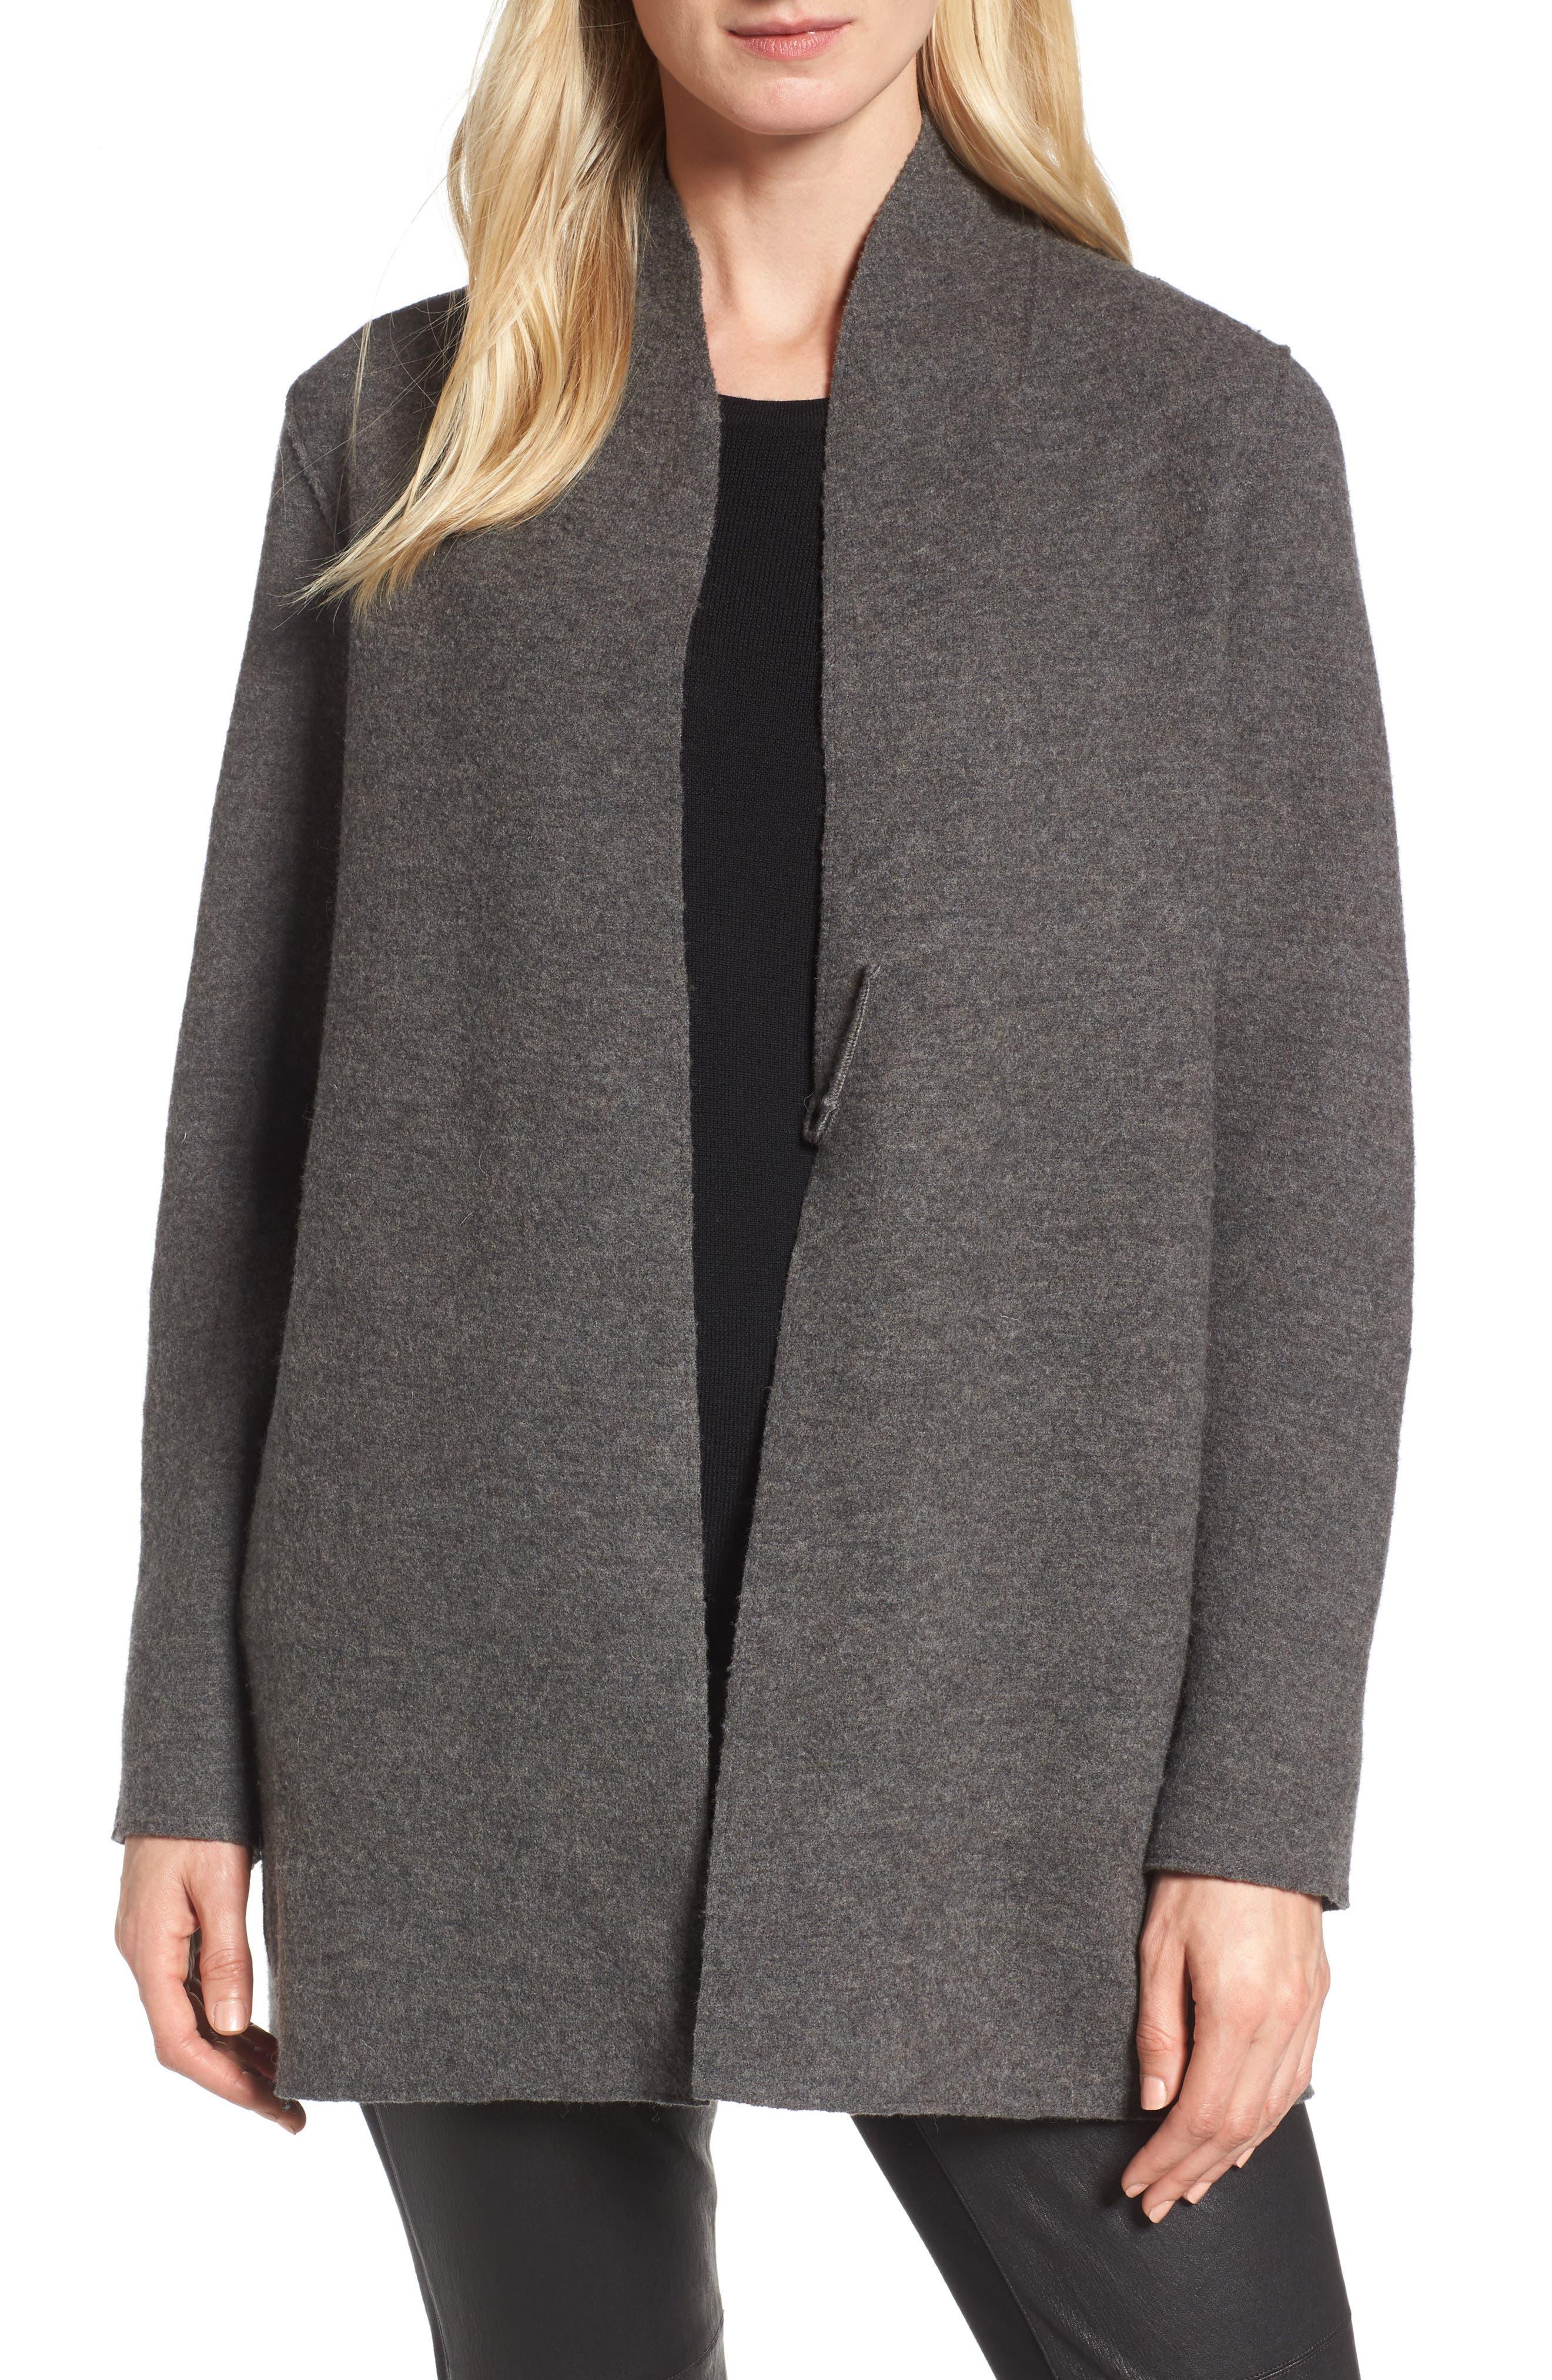 Boiled Wool Jacket,                         Main,                         color, 210